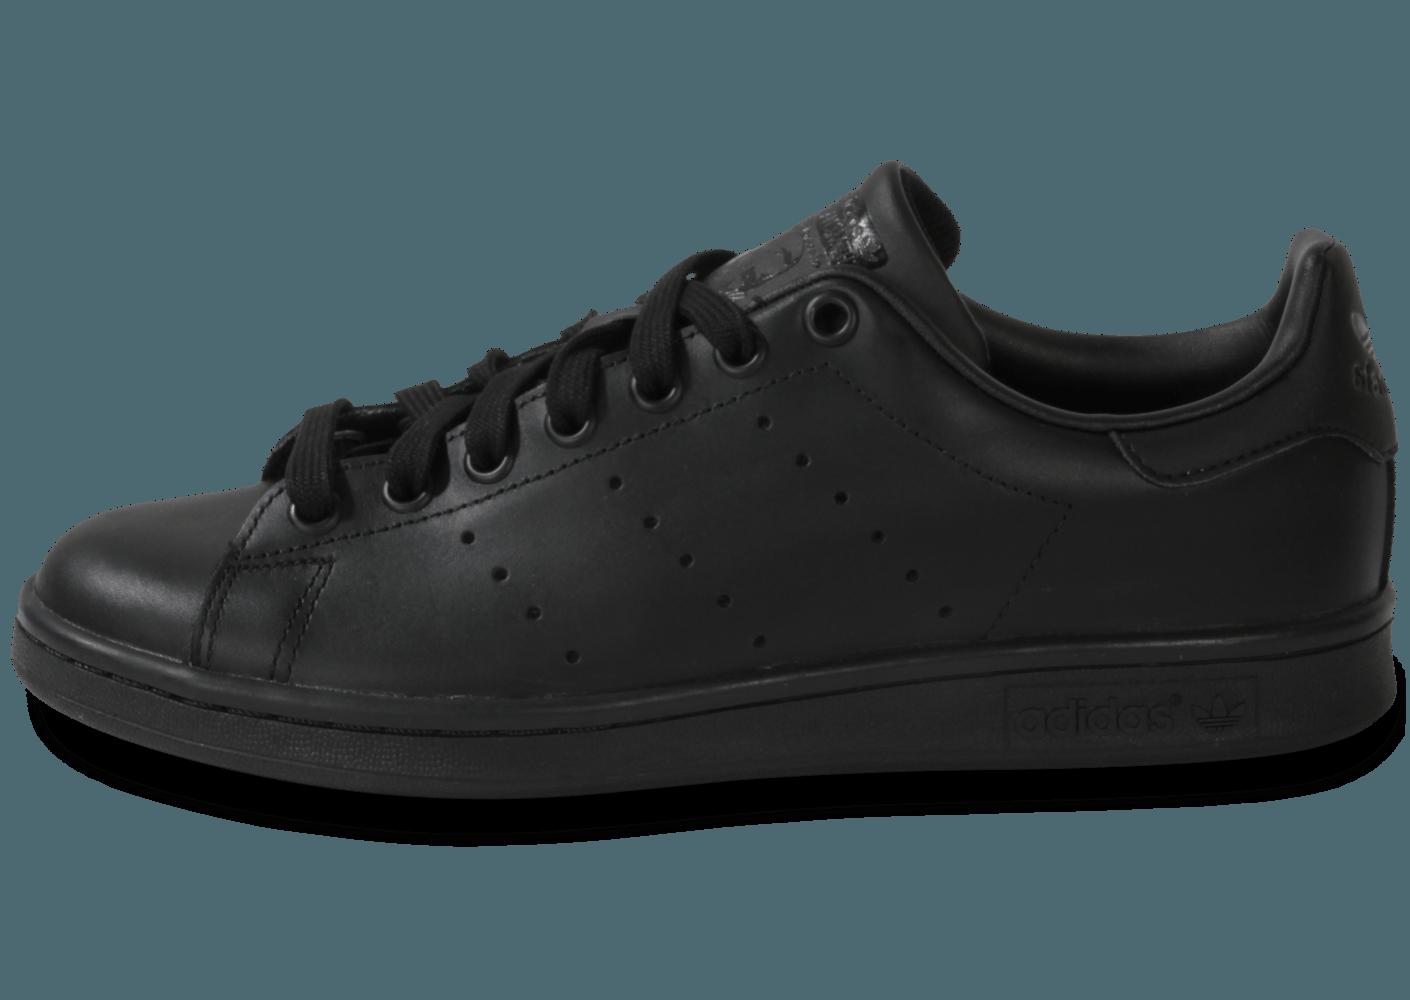 adidas chaussure noir homme